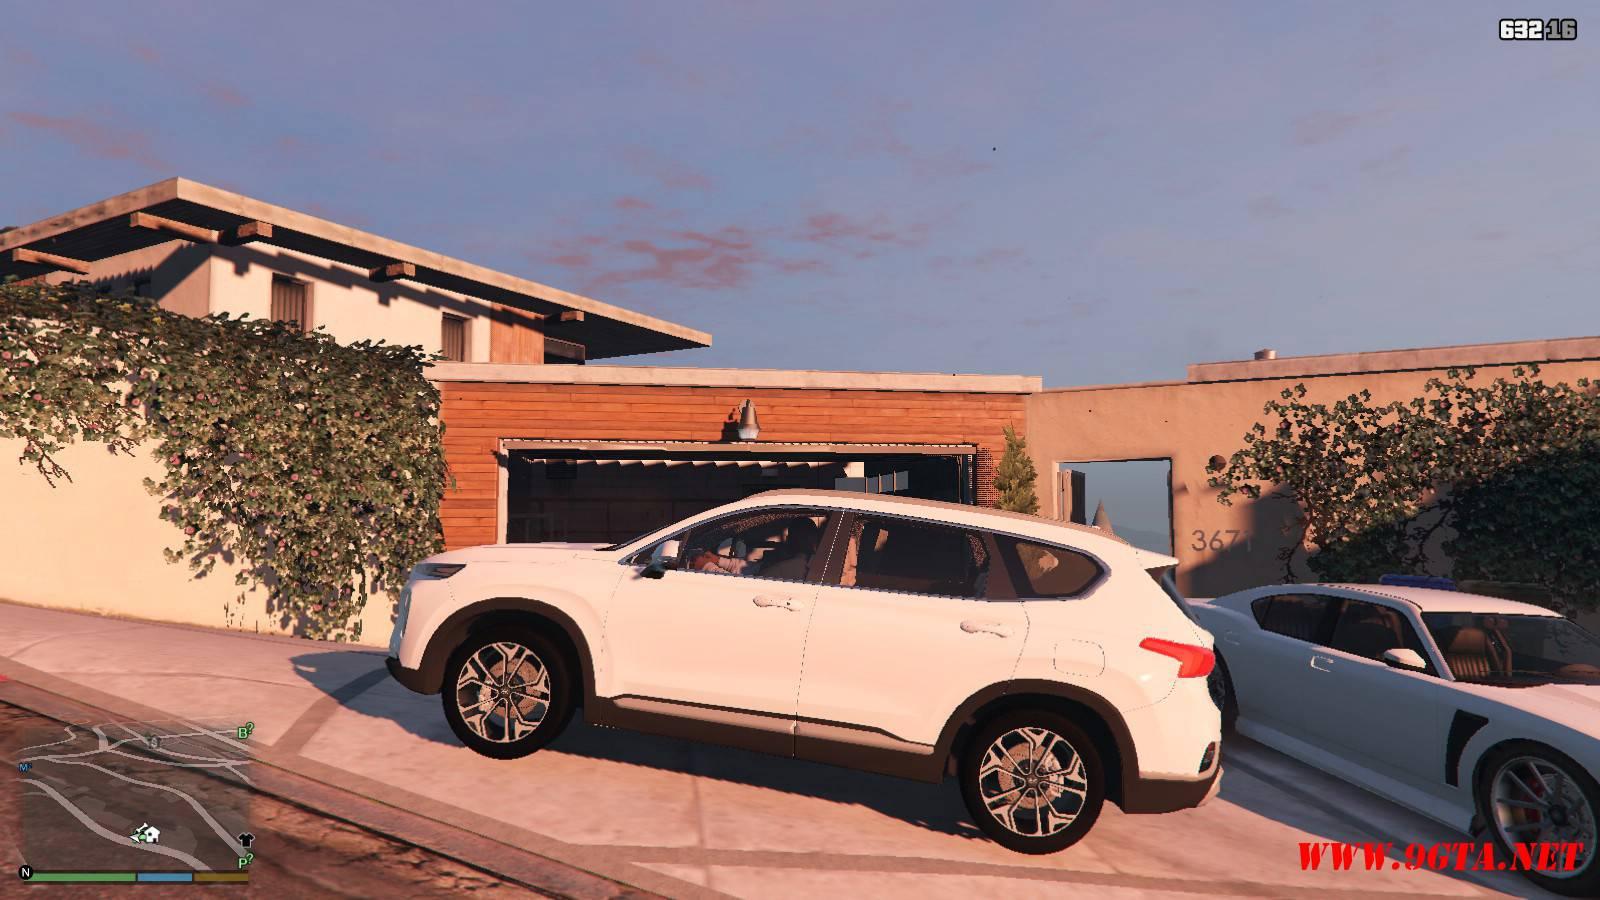 2019 Huyndai Santa Fe GTA5 mods (2)